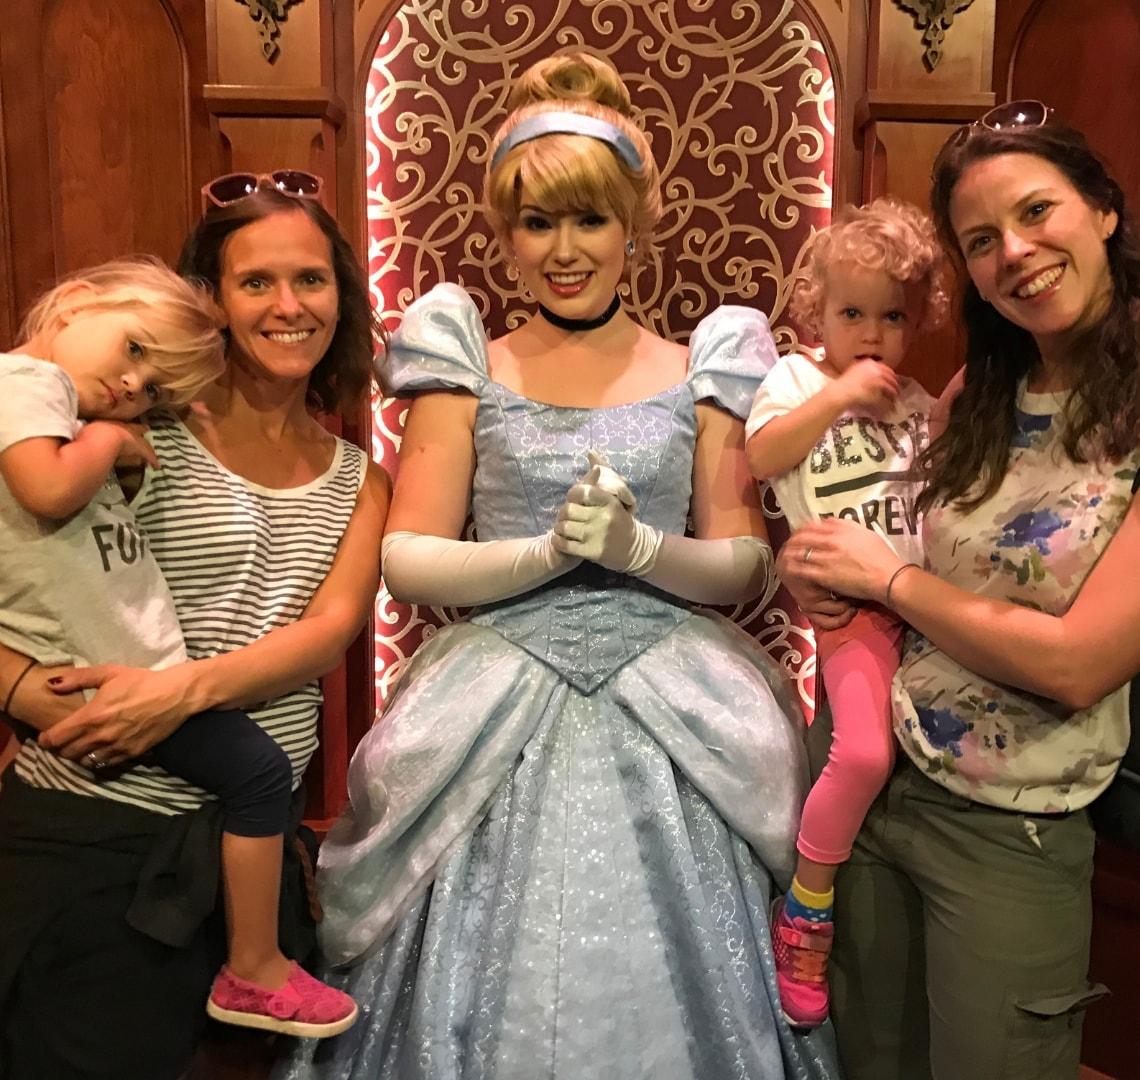 Disney - Cousin Wanderlust, SIL Wanderlust, Cinderella, Thing 2 and me